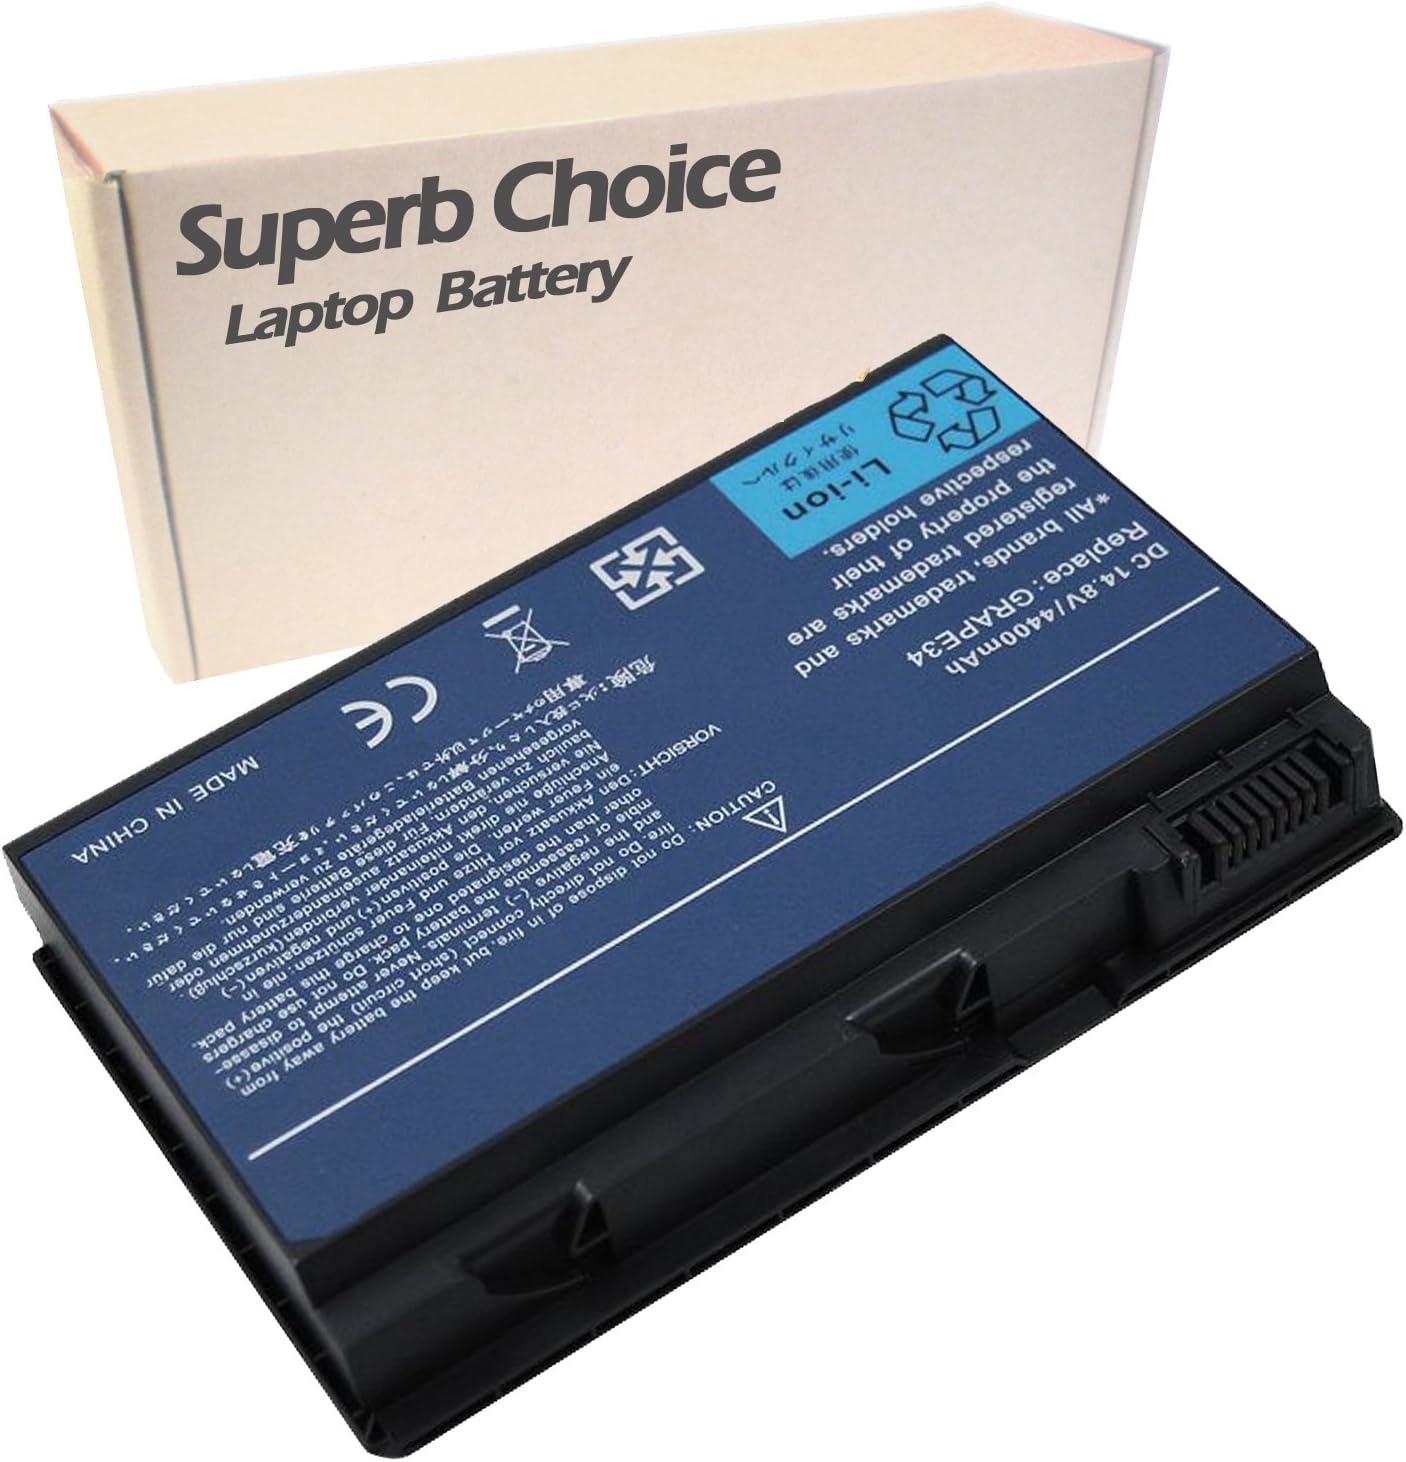 Superb Choice 8-Cell Battery Compatible with ACER Extensa 5210 5230 5230E 5230E-2177